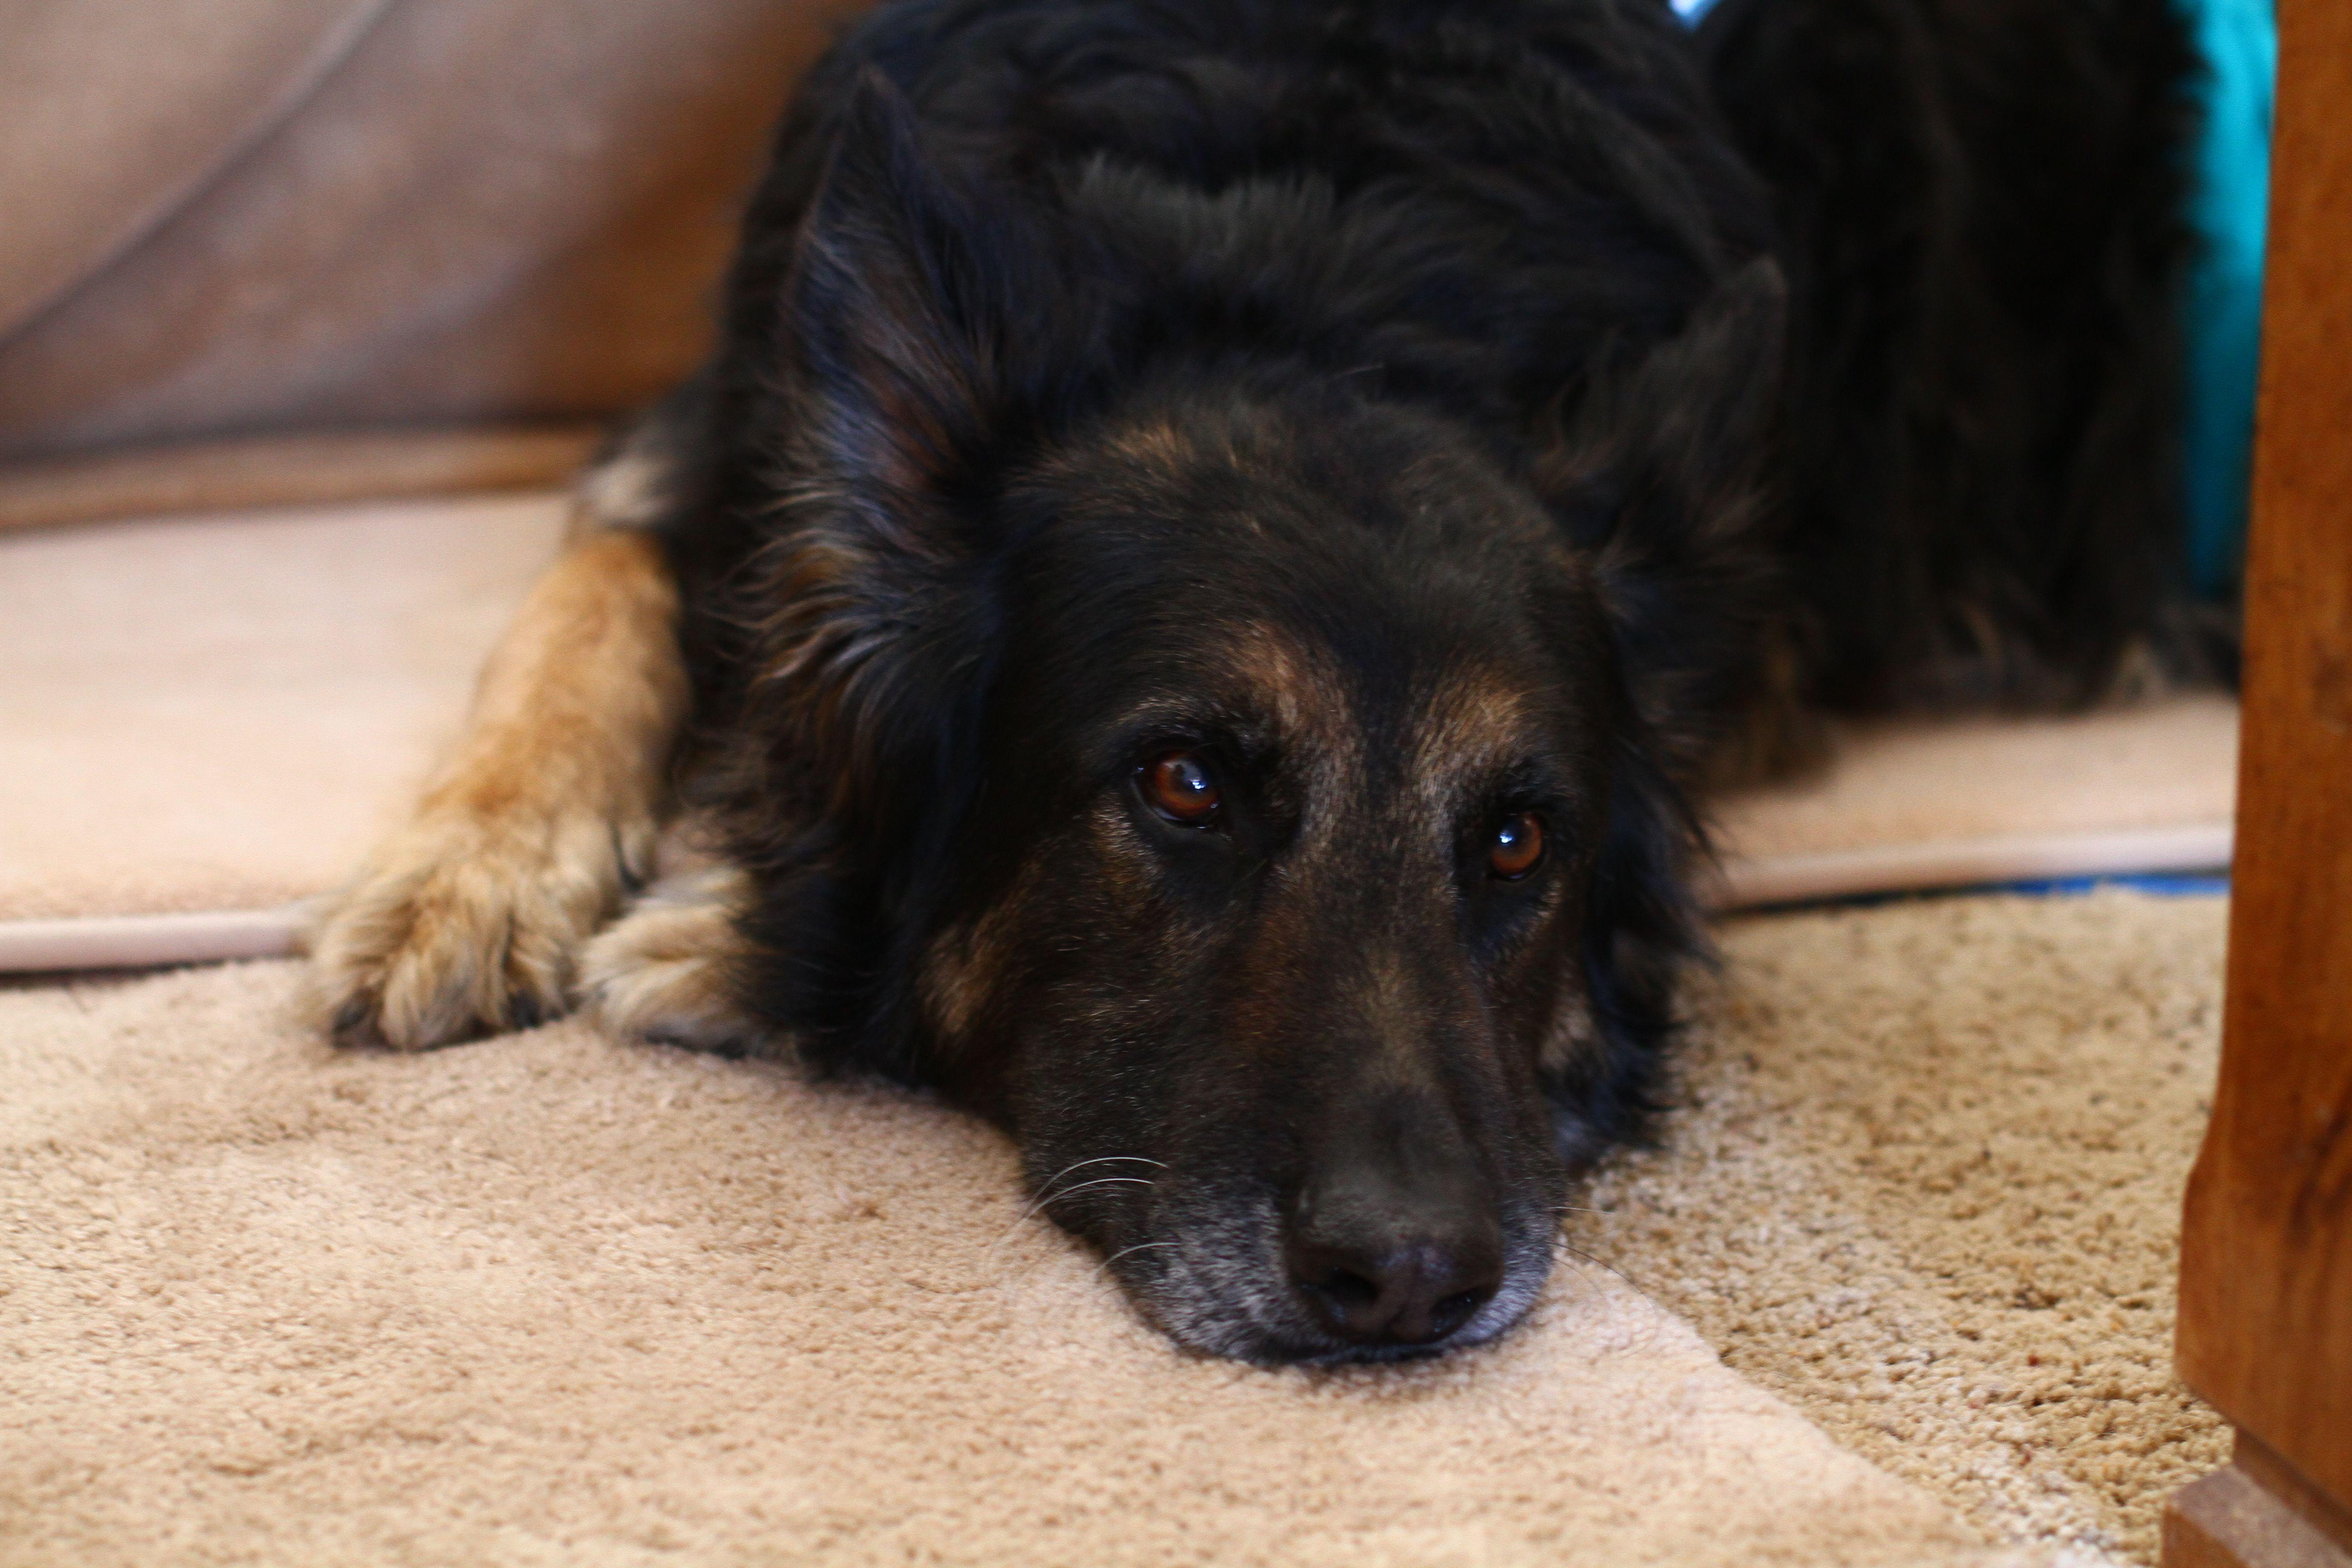 Skylar, German shepherd, FORMER shelter dog. Adopt from a